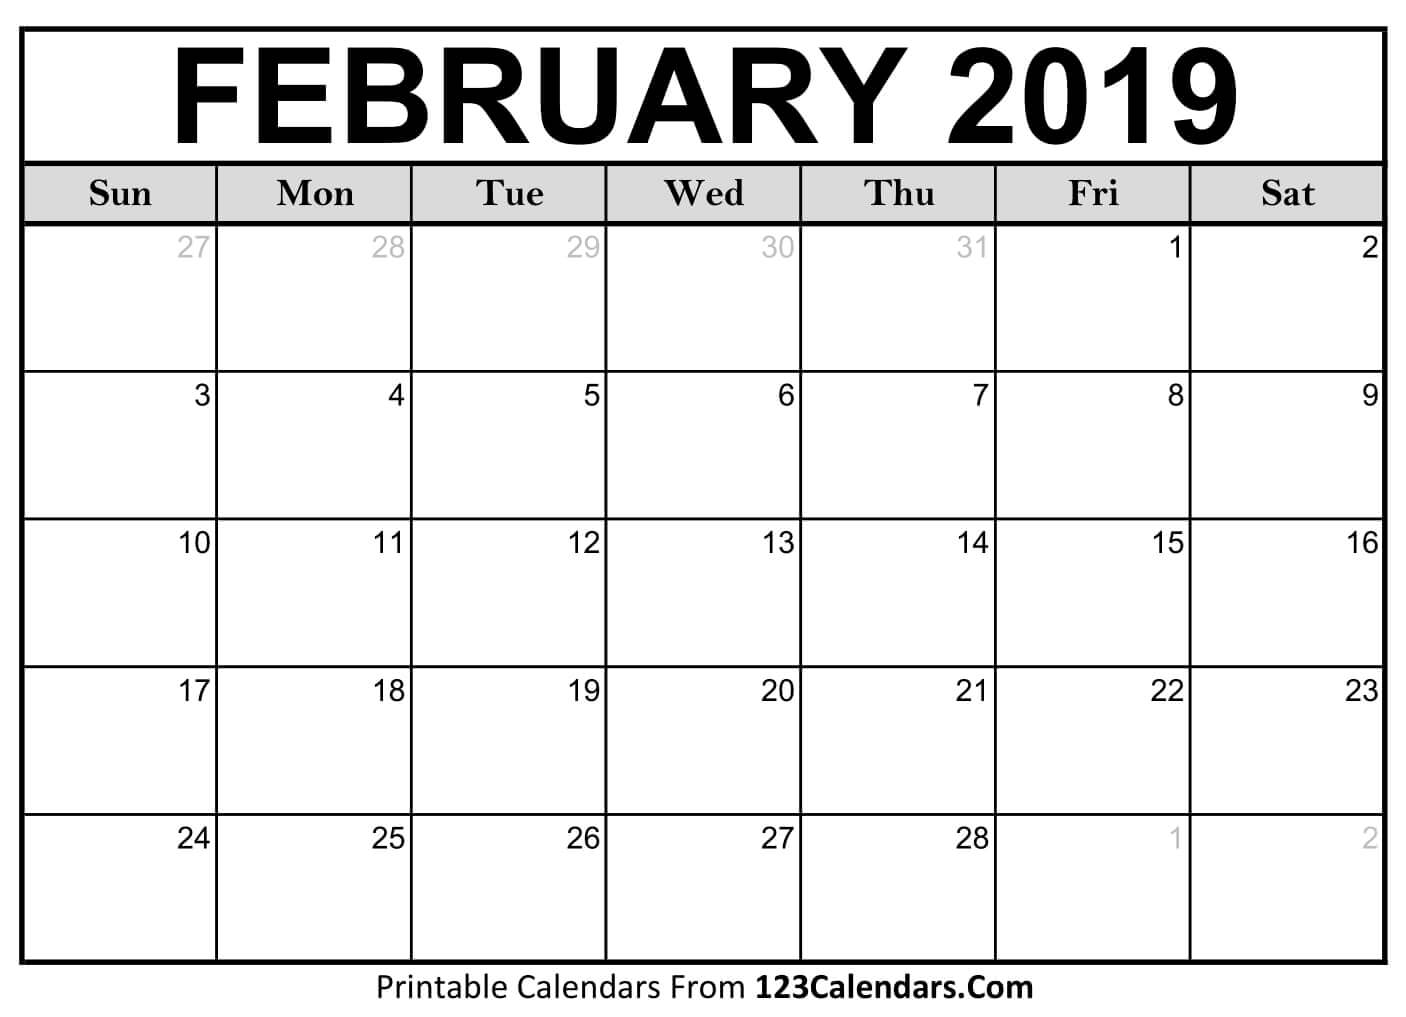 Printable February 2019 Calendar Template Free Download